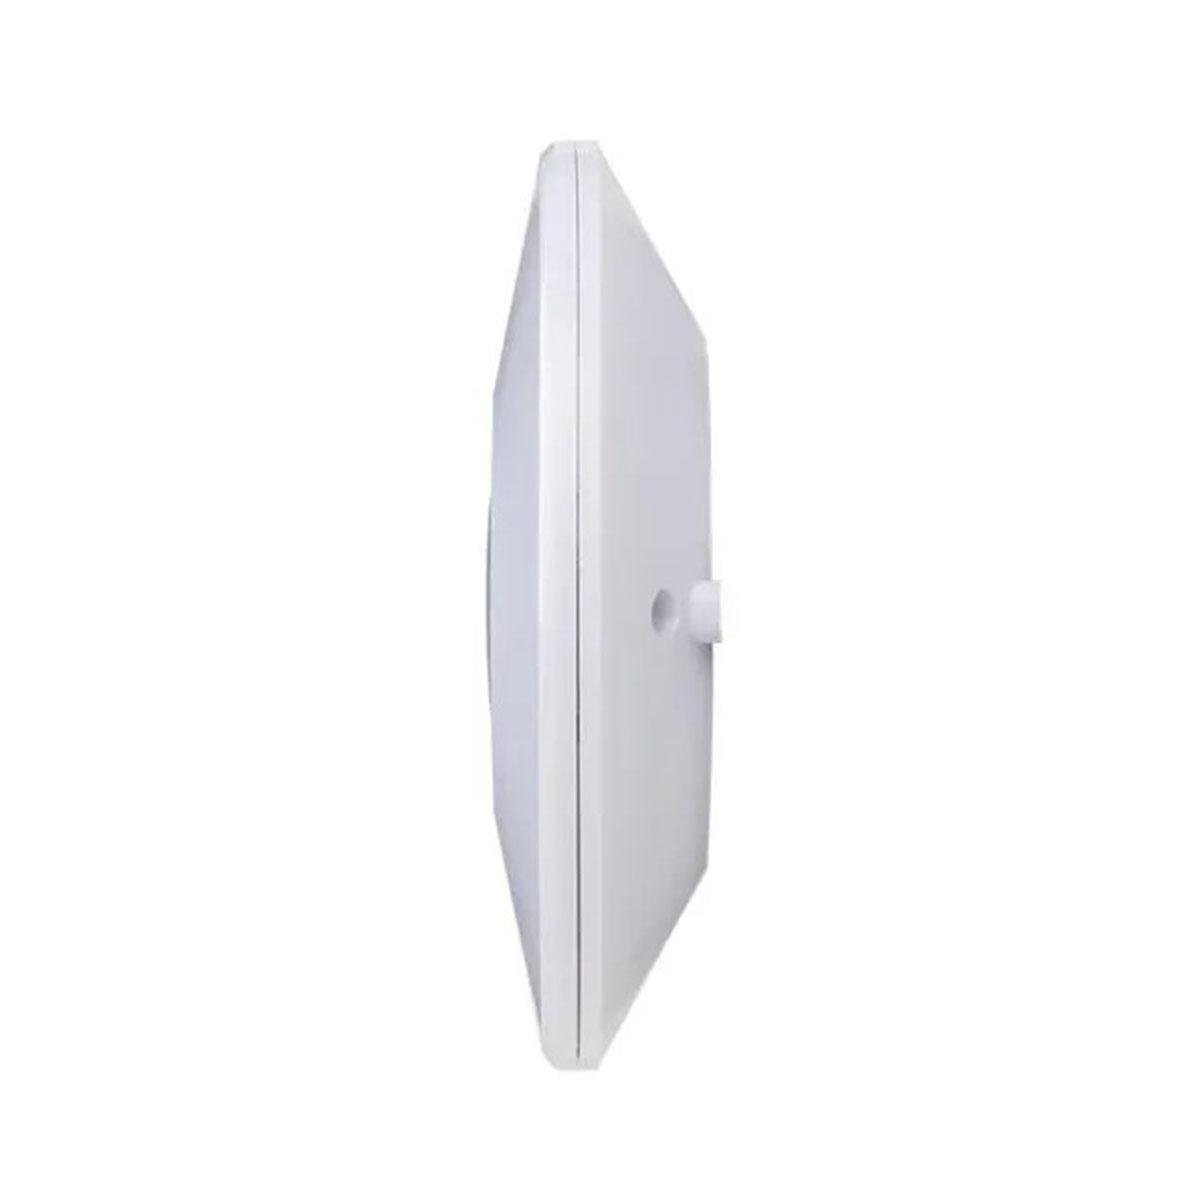 Kit 02 Sensor De Presença Intelbras Para Iluminação Esp 360